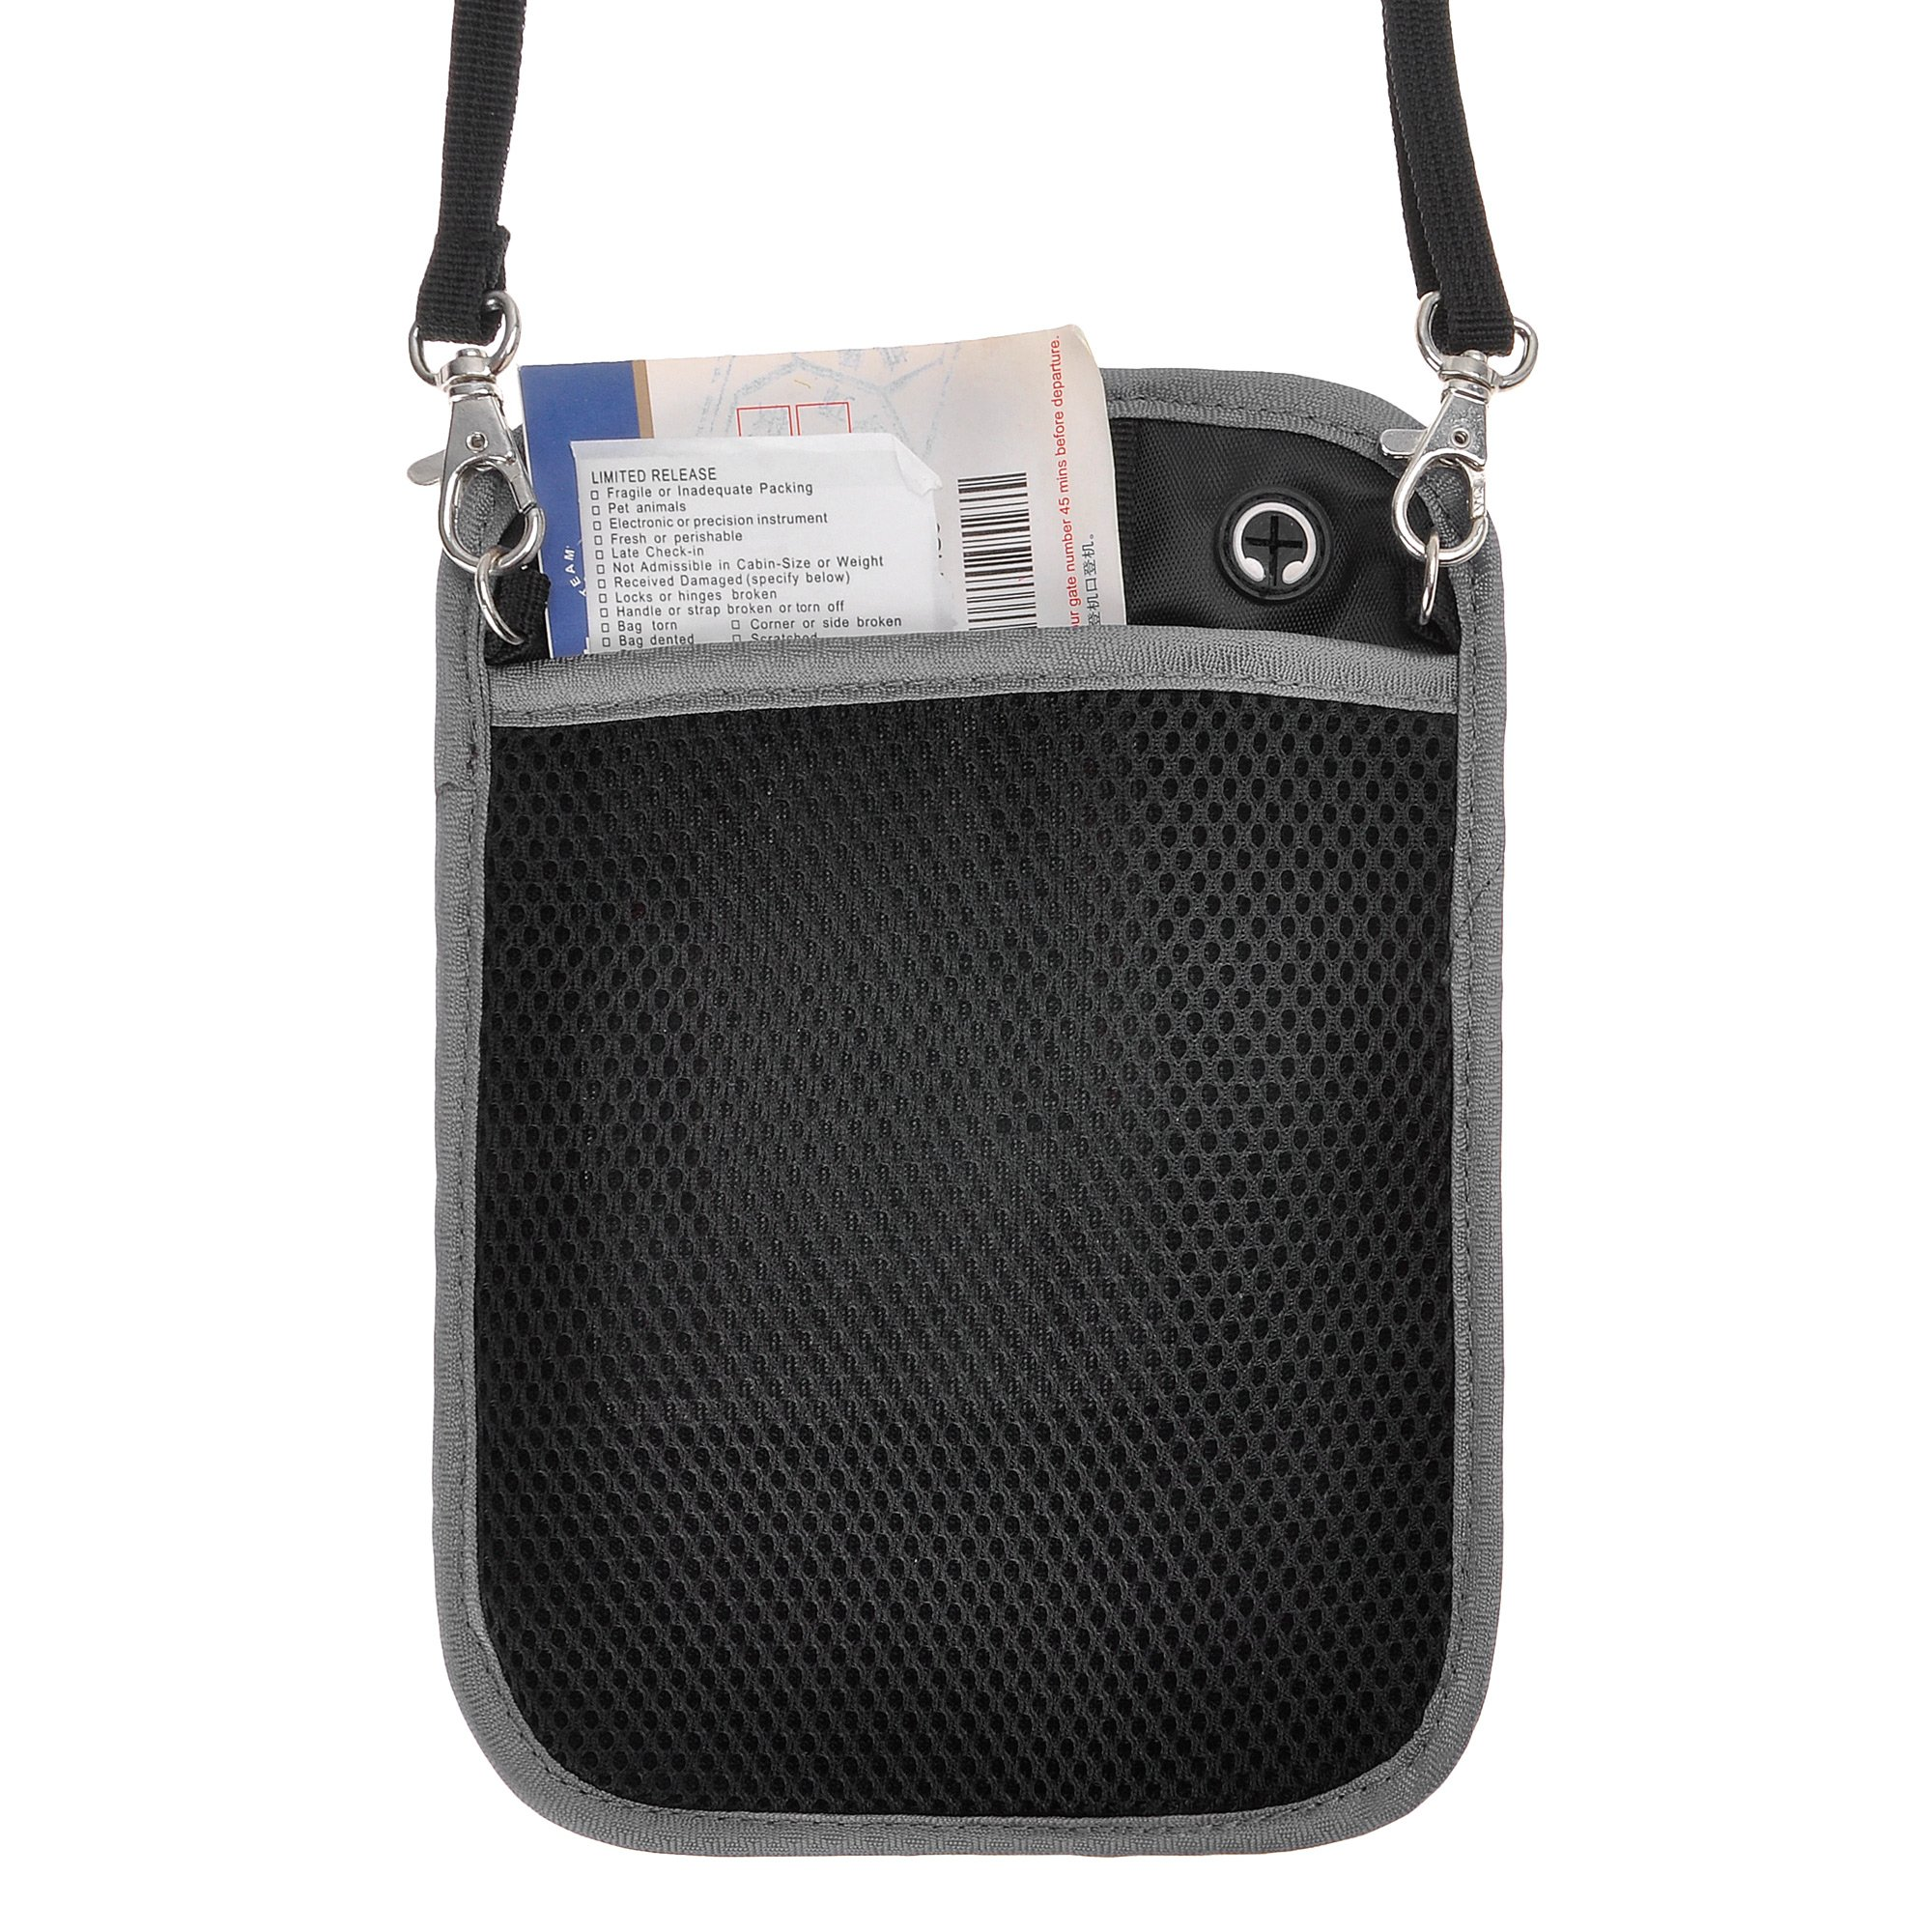 RFID Blocking 2-in-1 Travel Neck Stash and Belt Wallet Security Hidden Passport Holder Pouch by ZLYC (Image #10)